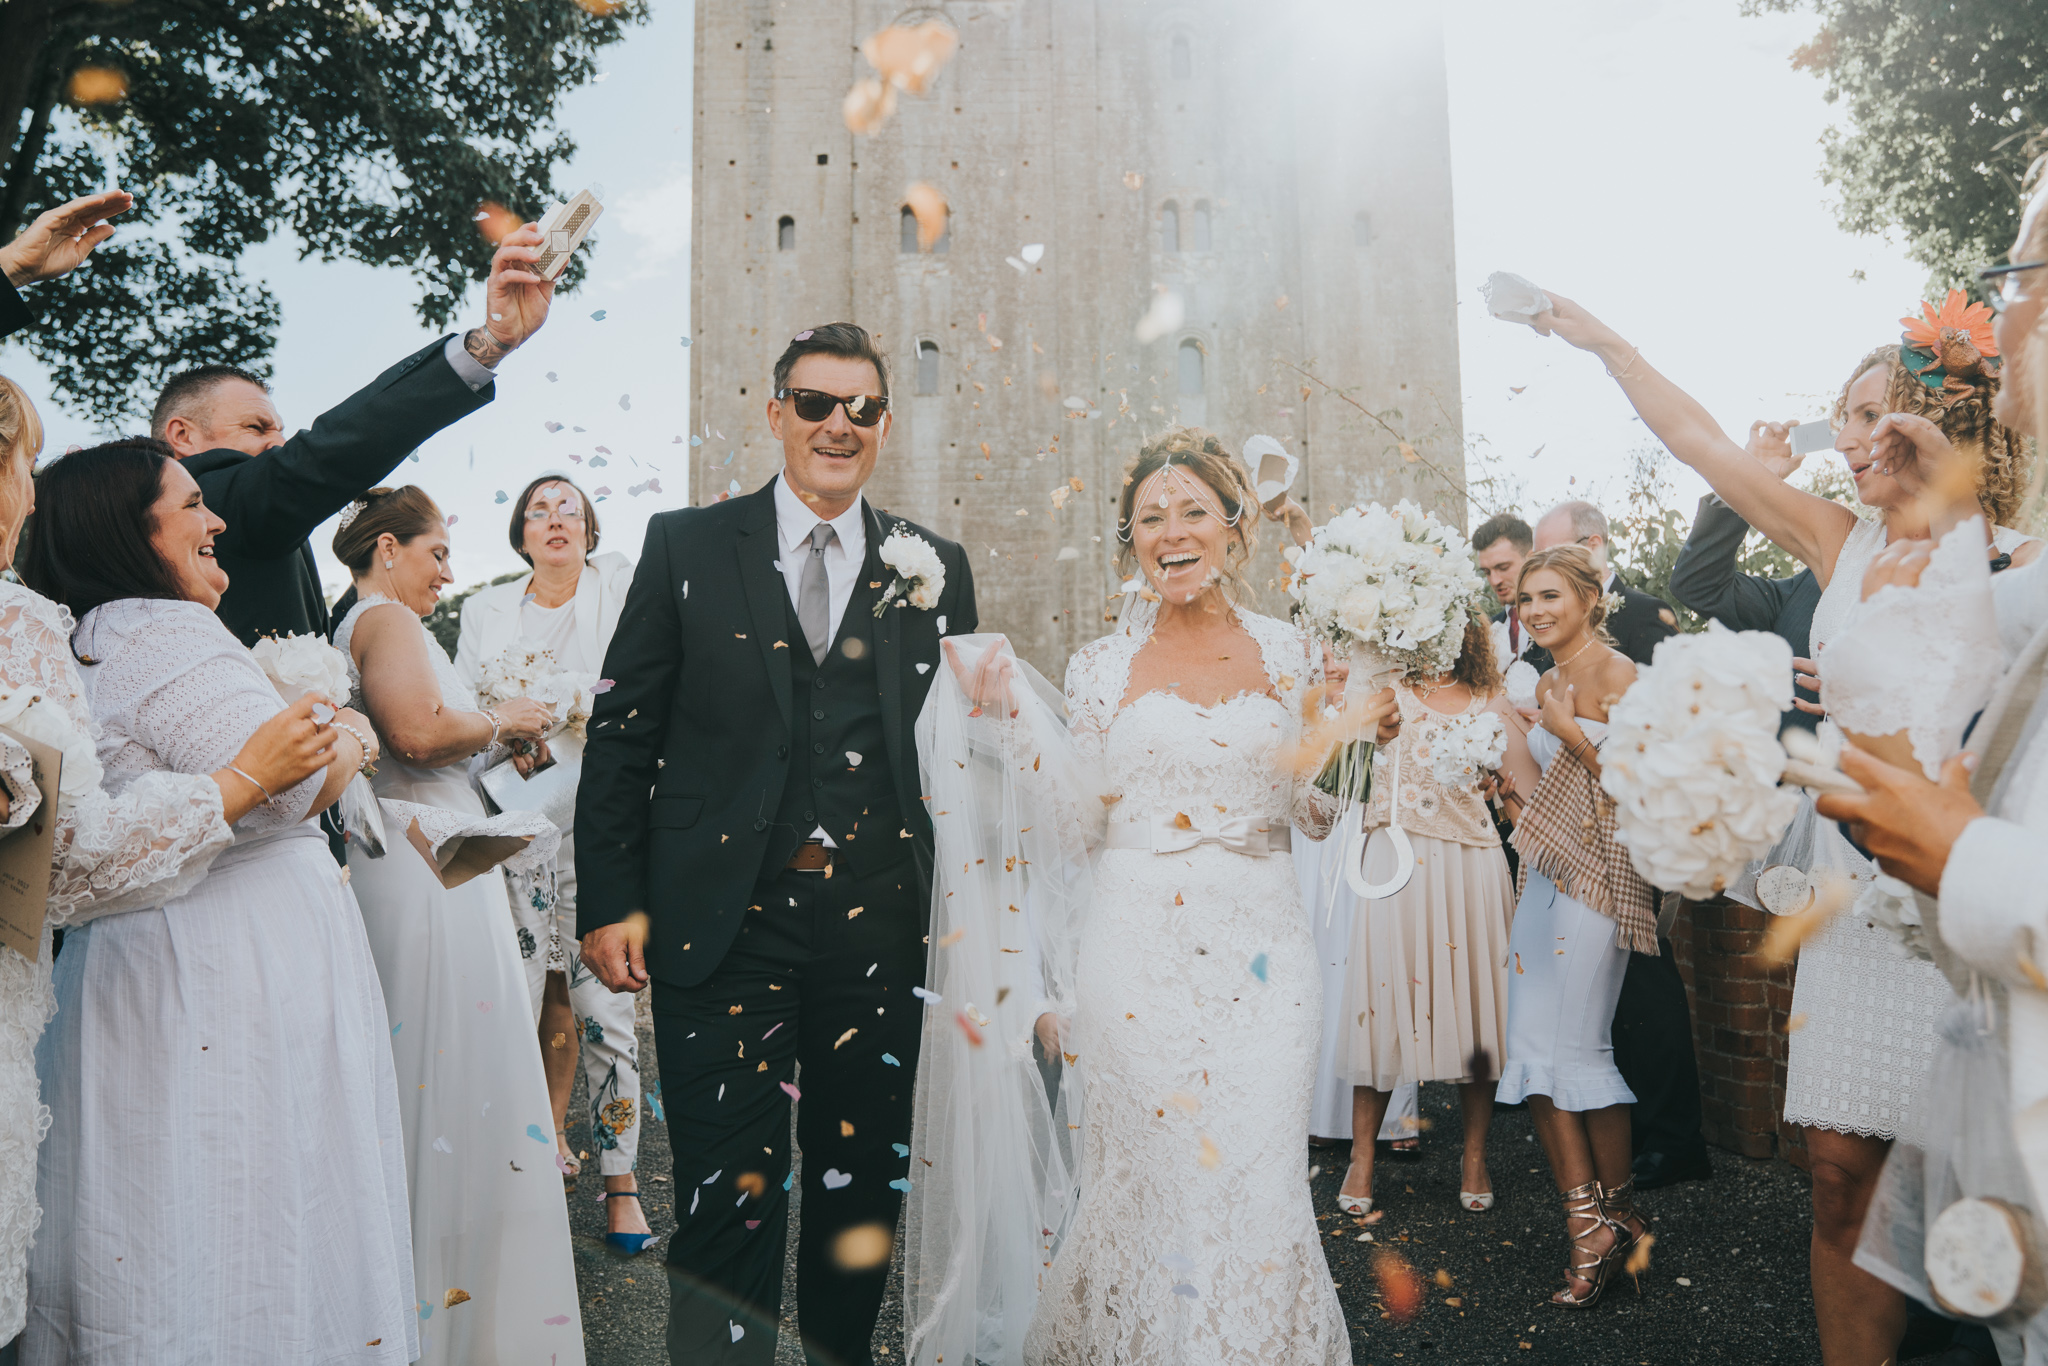 grace-elizabeth-boho-wedding-headingham-castle-essex-wedding-photographer-66.jpg